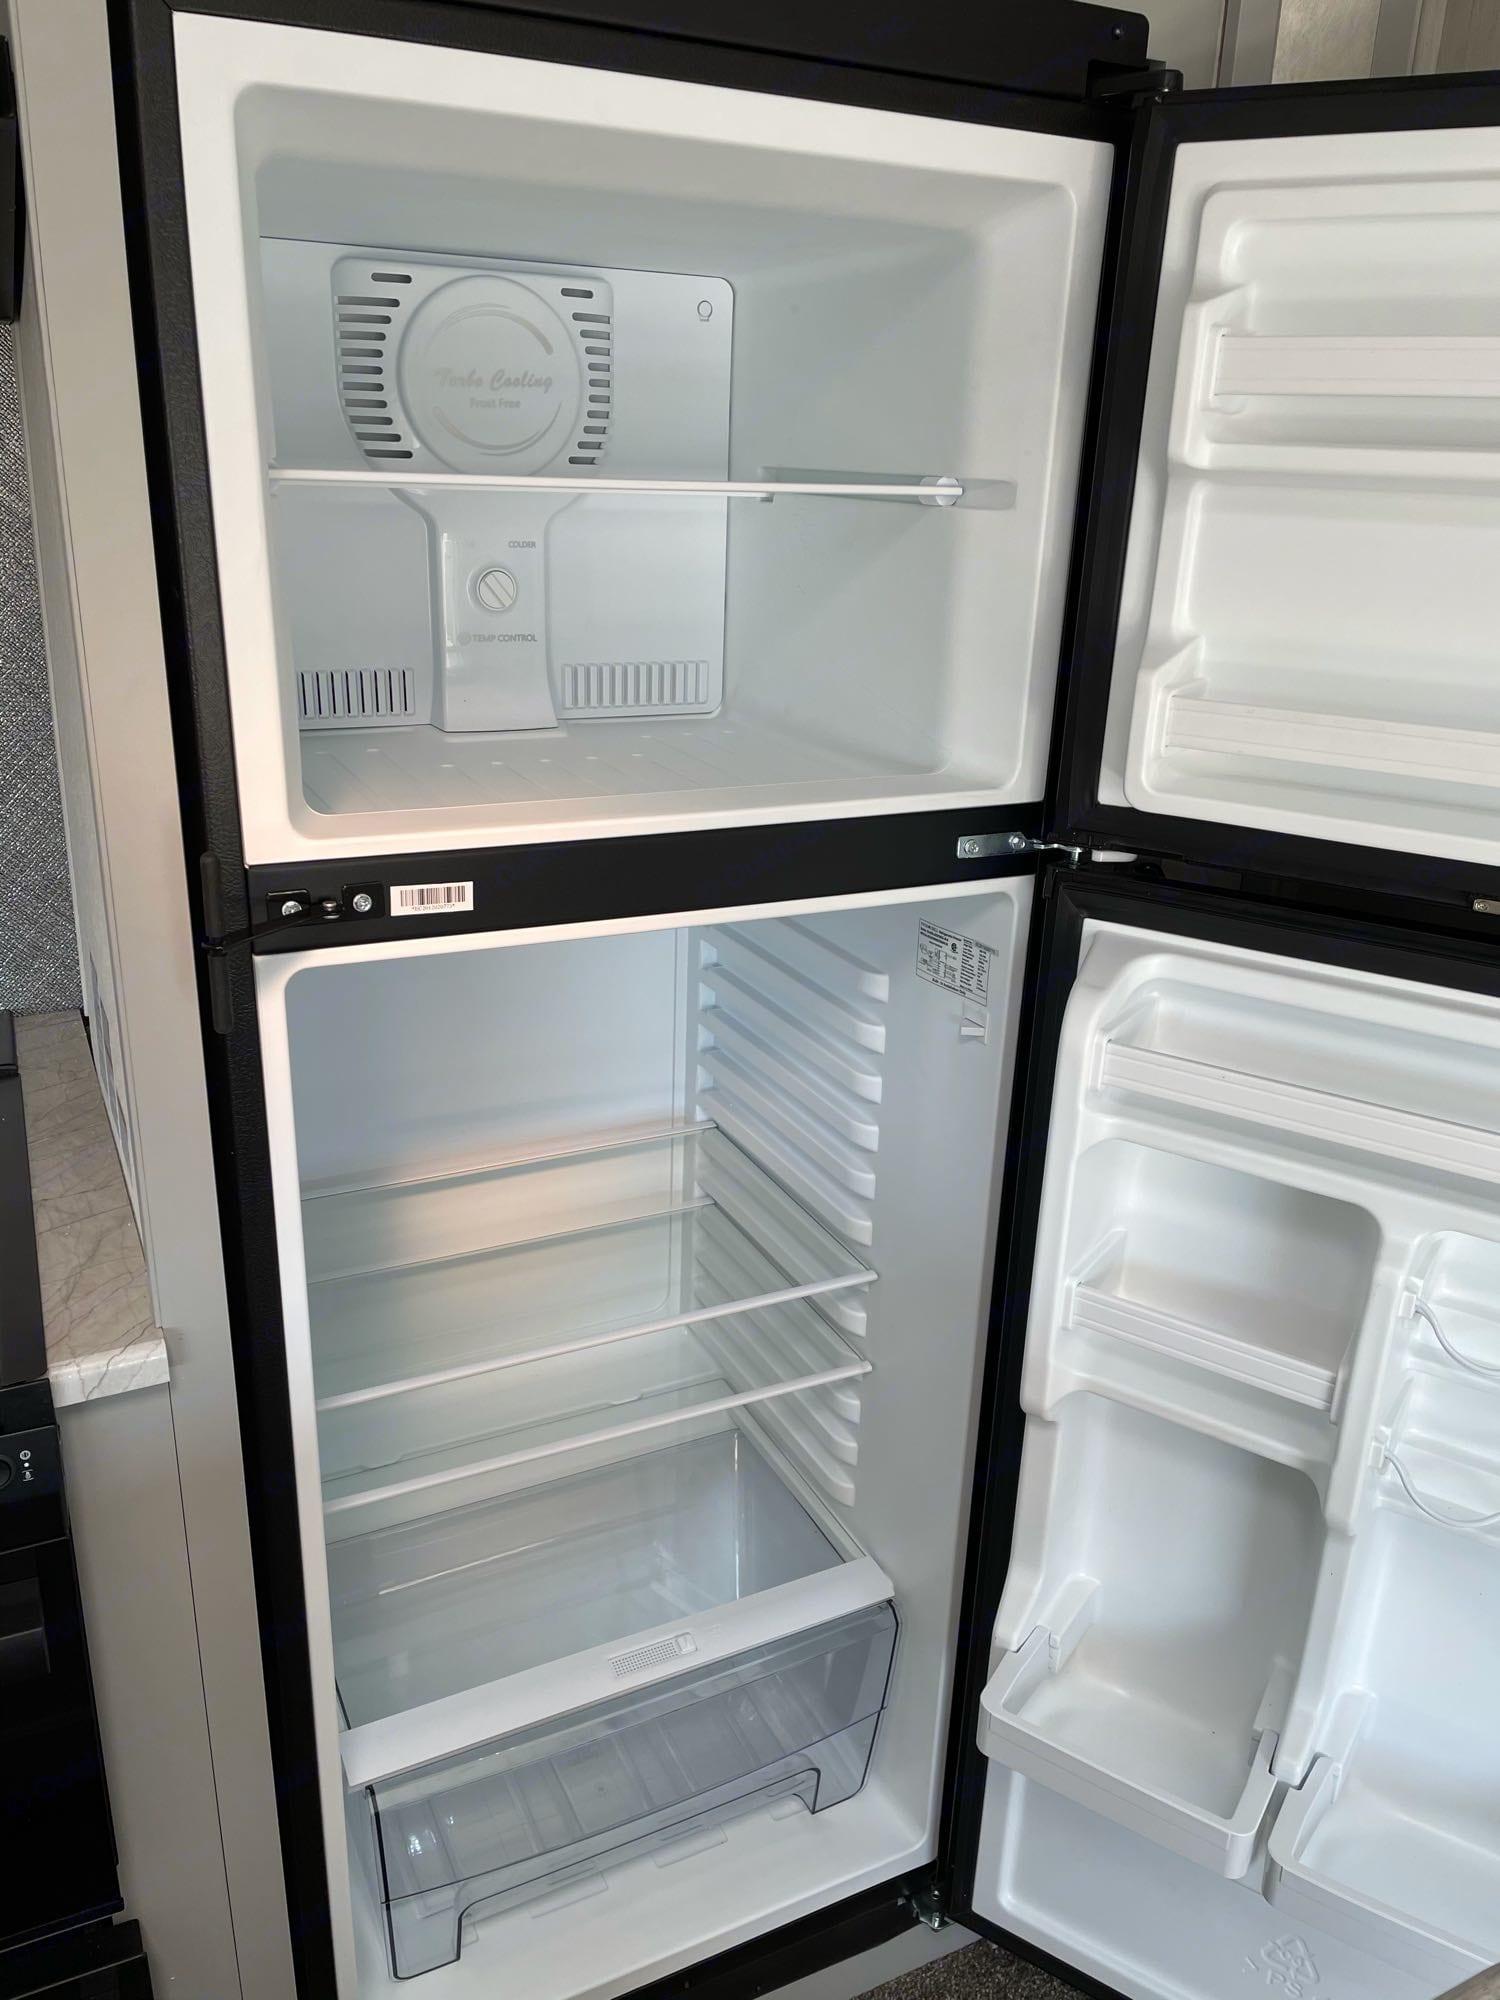 12V Refrigerator. Forest River Vibe 2021